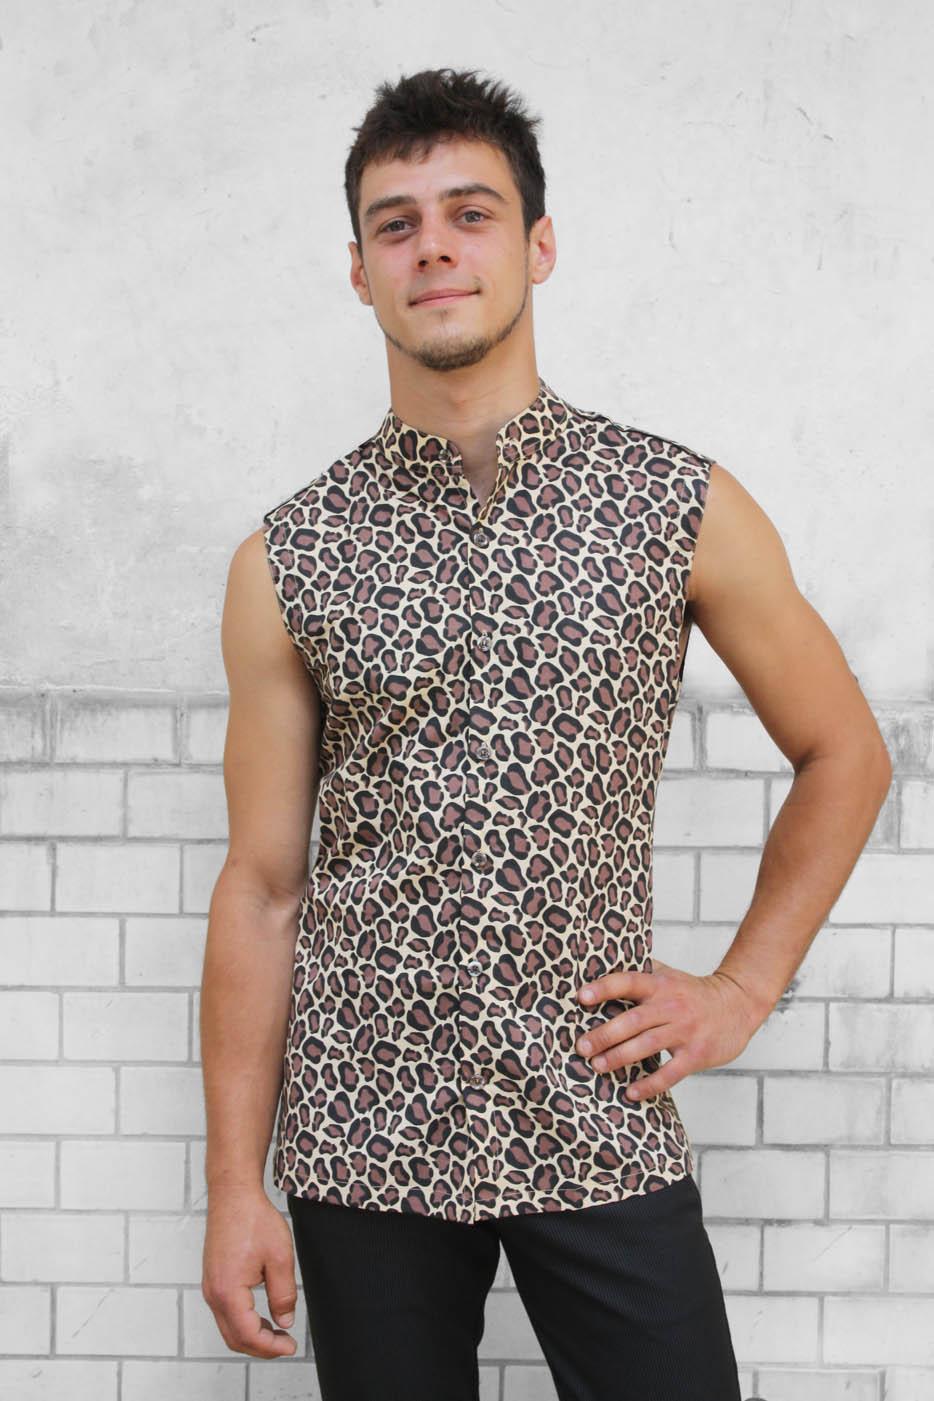 chemise sans manche leopard ba sap. Black Bedroom Furniture Sets. Home Design Ideas